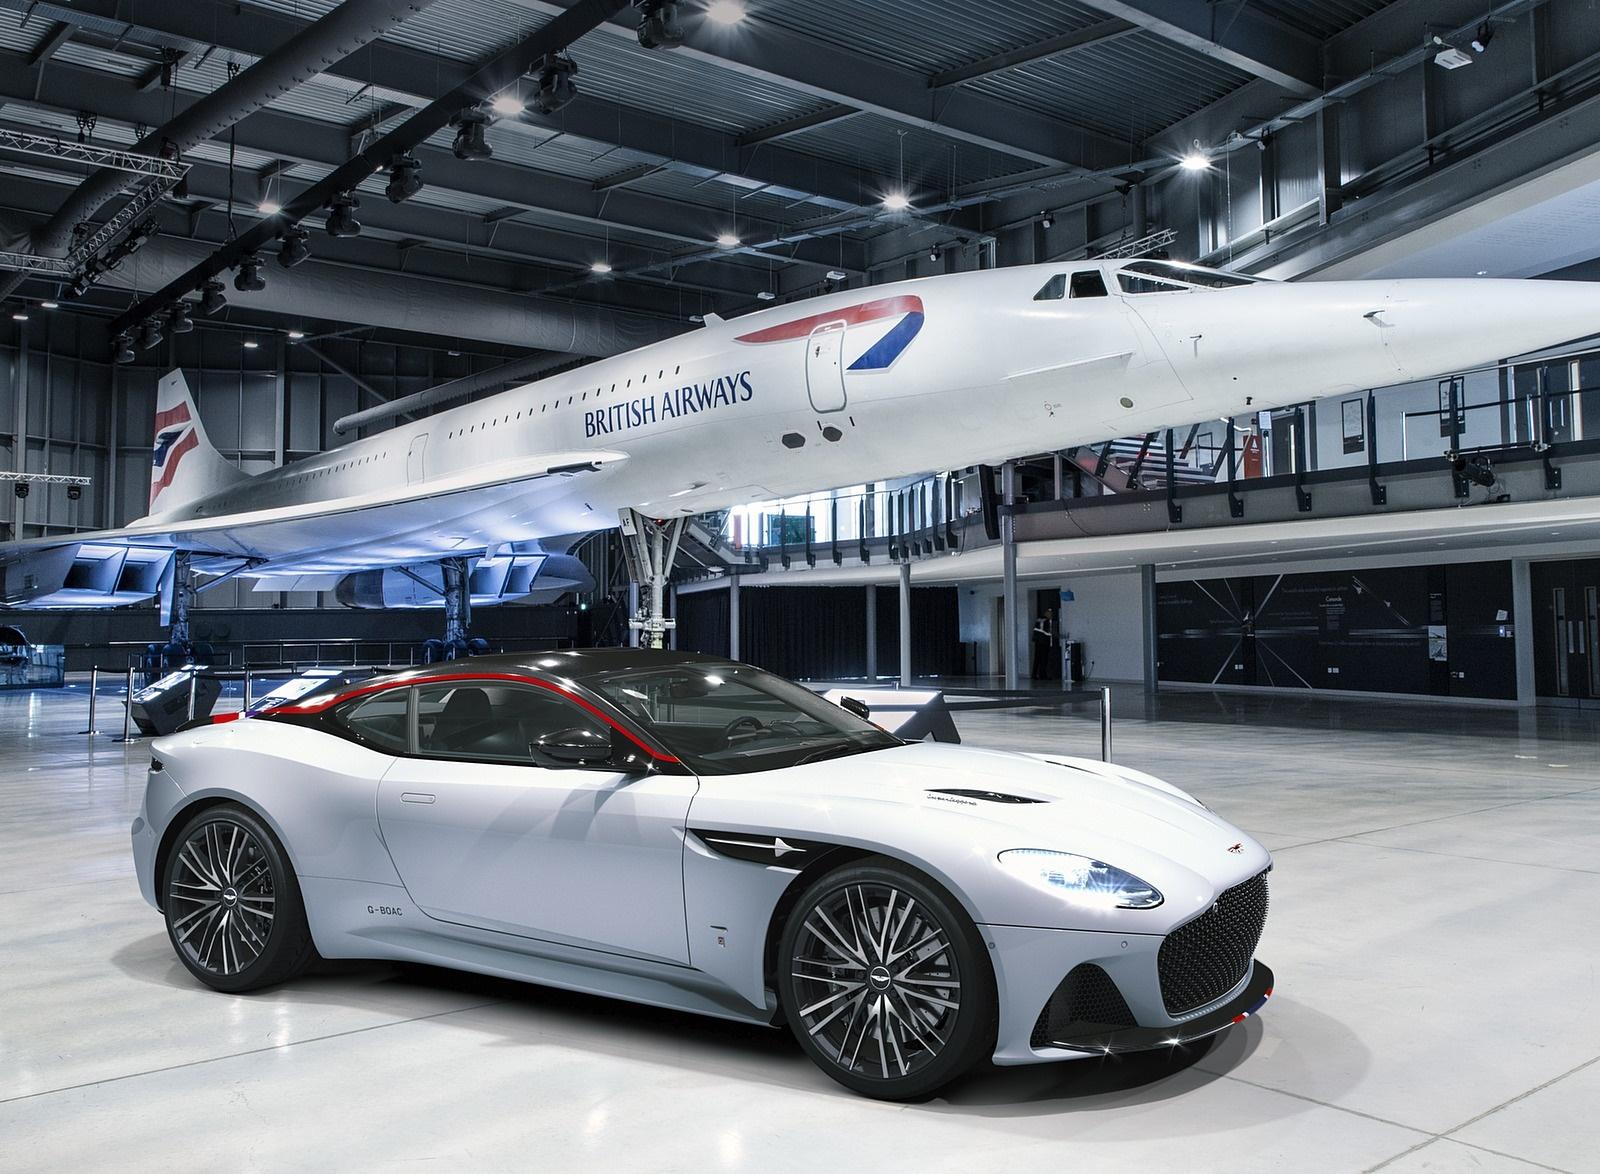 2019 Aston Martin DBS Superleggera Concorde Edition Front Three-Quarter Wallpapers (1)